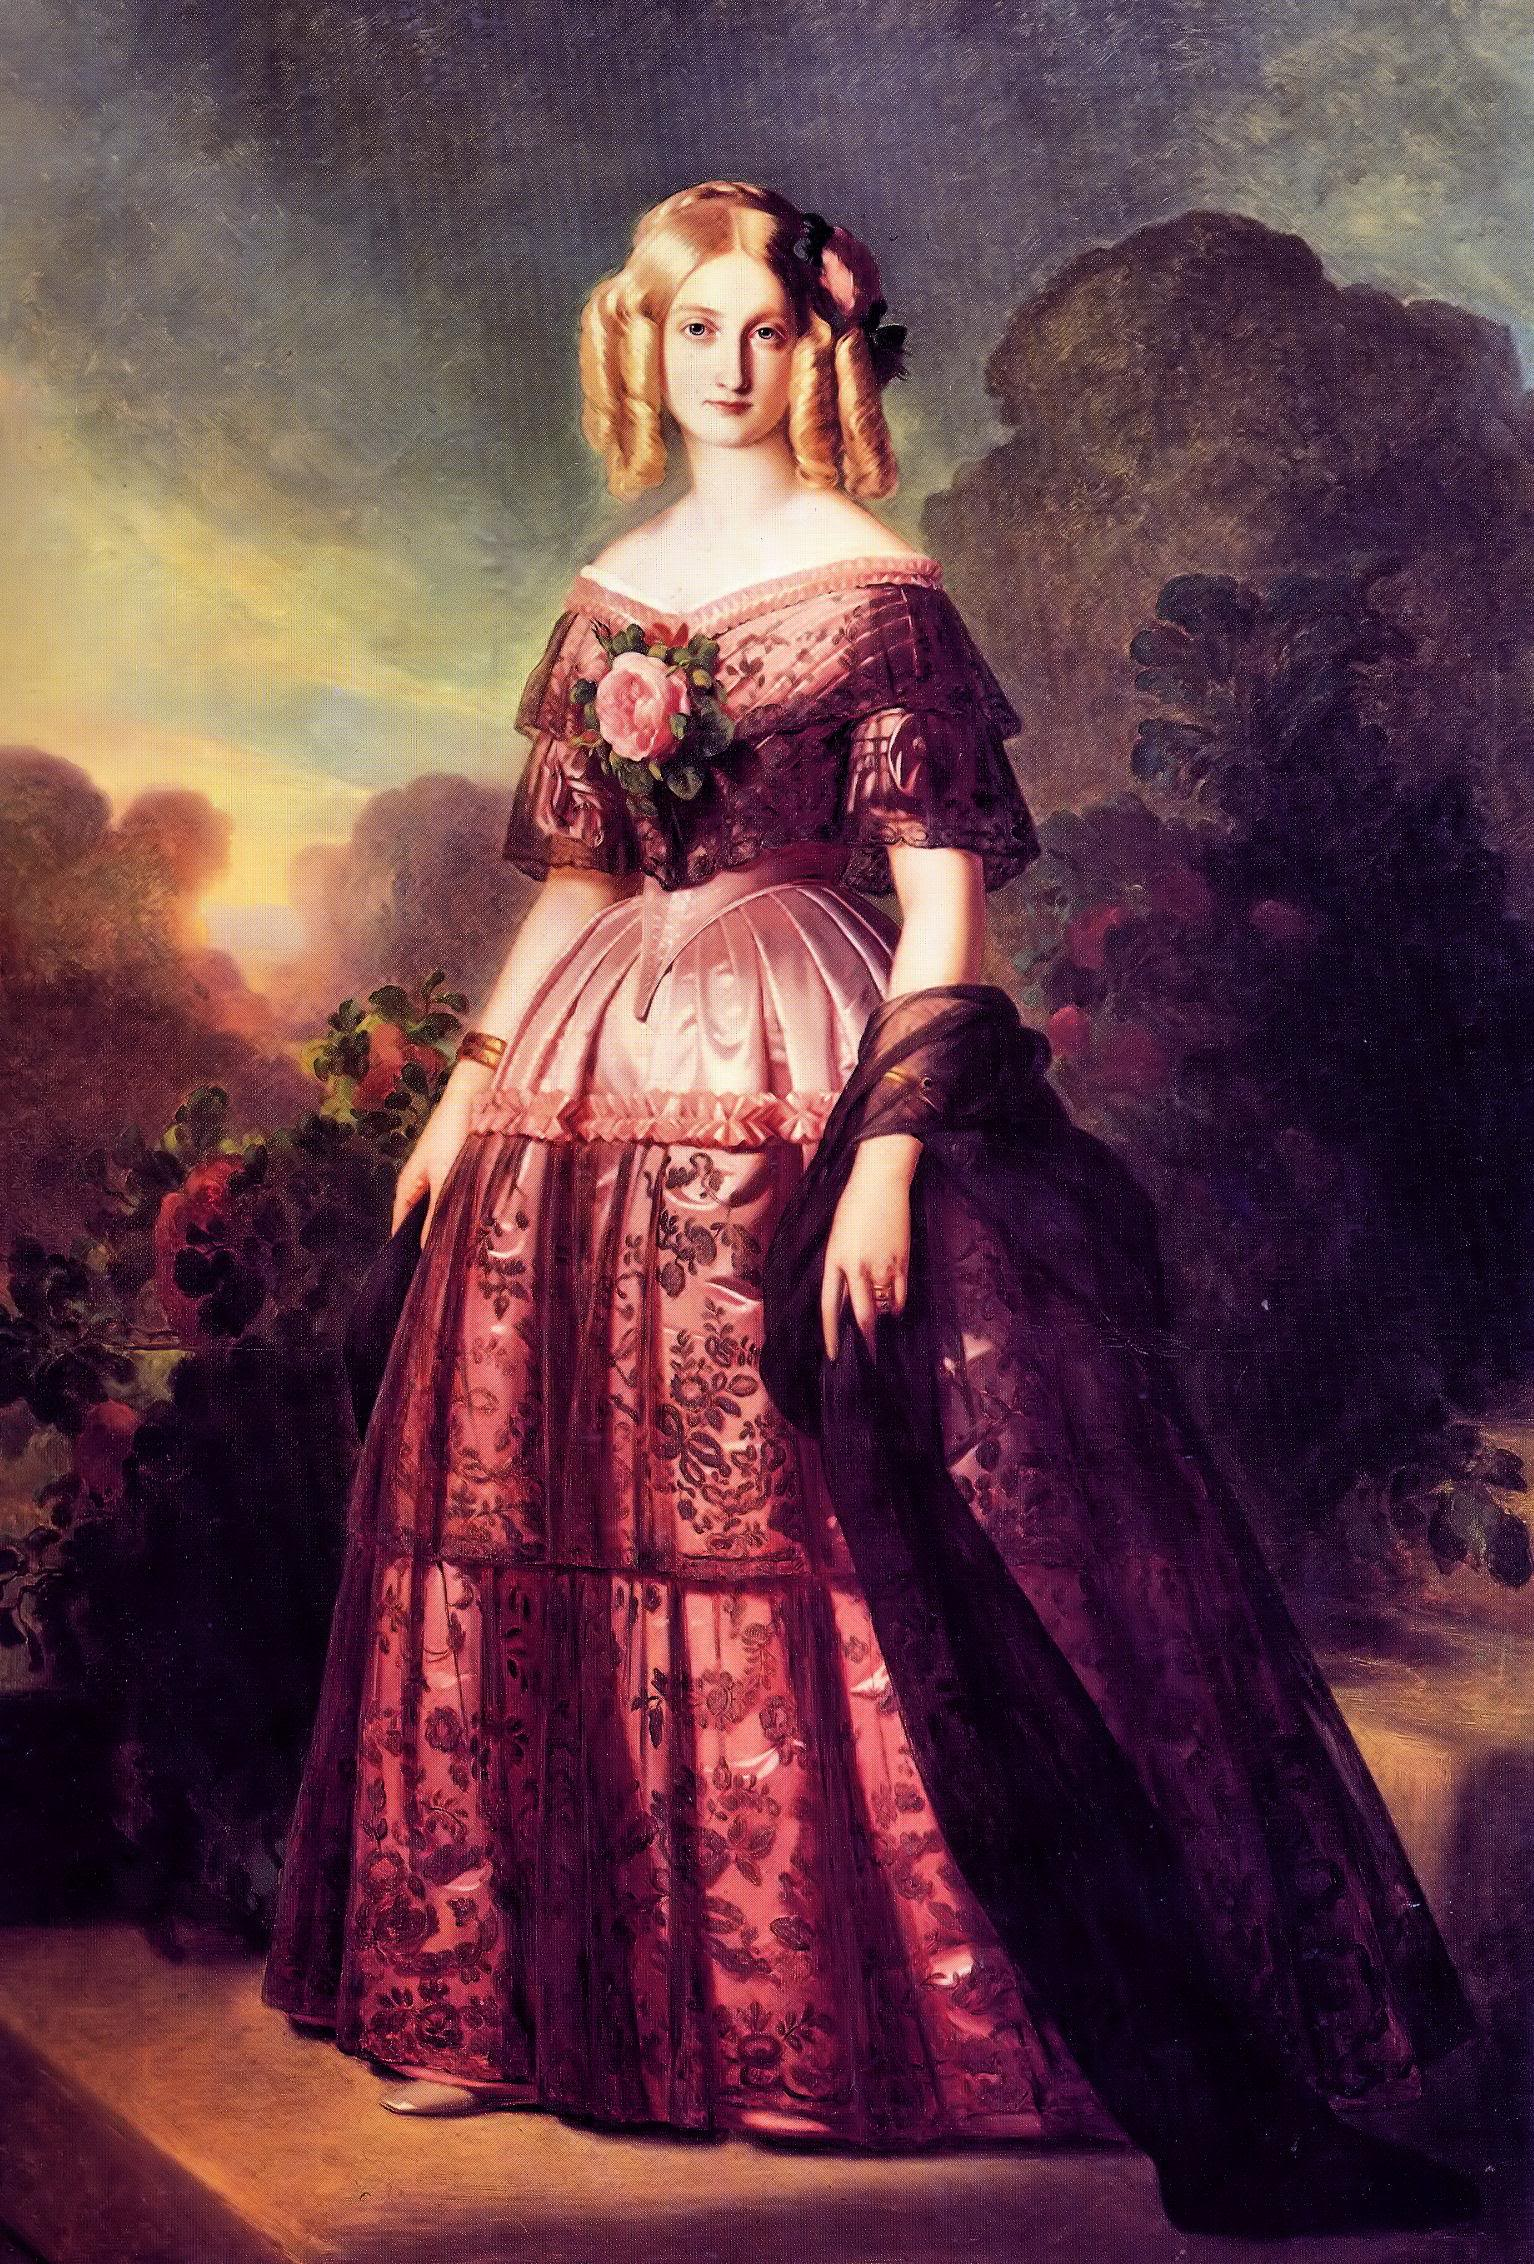 http://www.gogmsite.net/_Media/1846_duchesse_daumale_by_fr.jpg